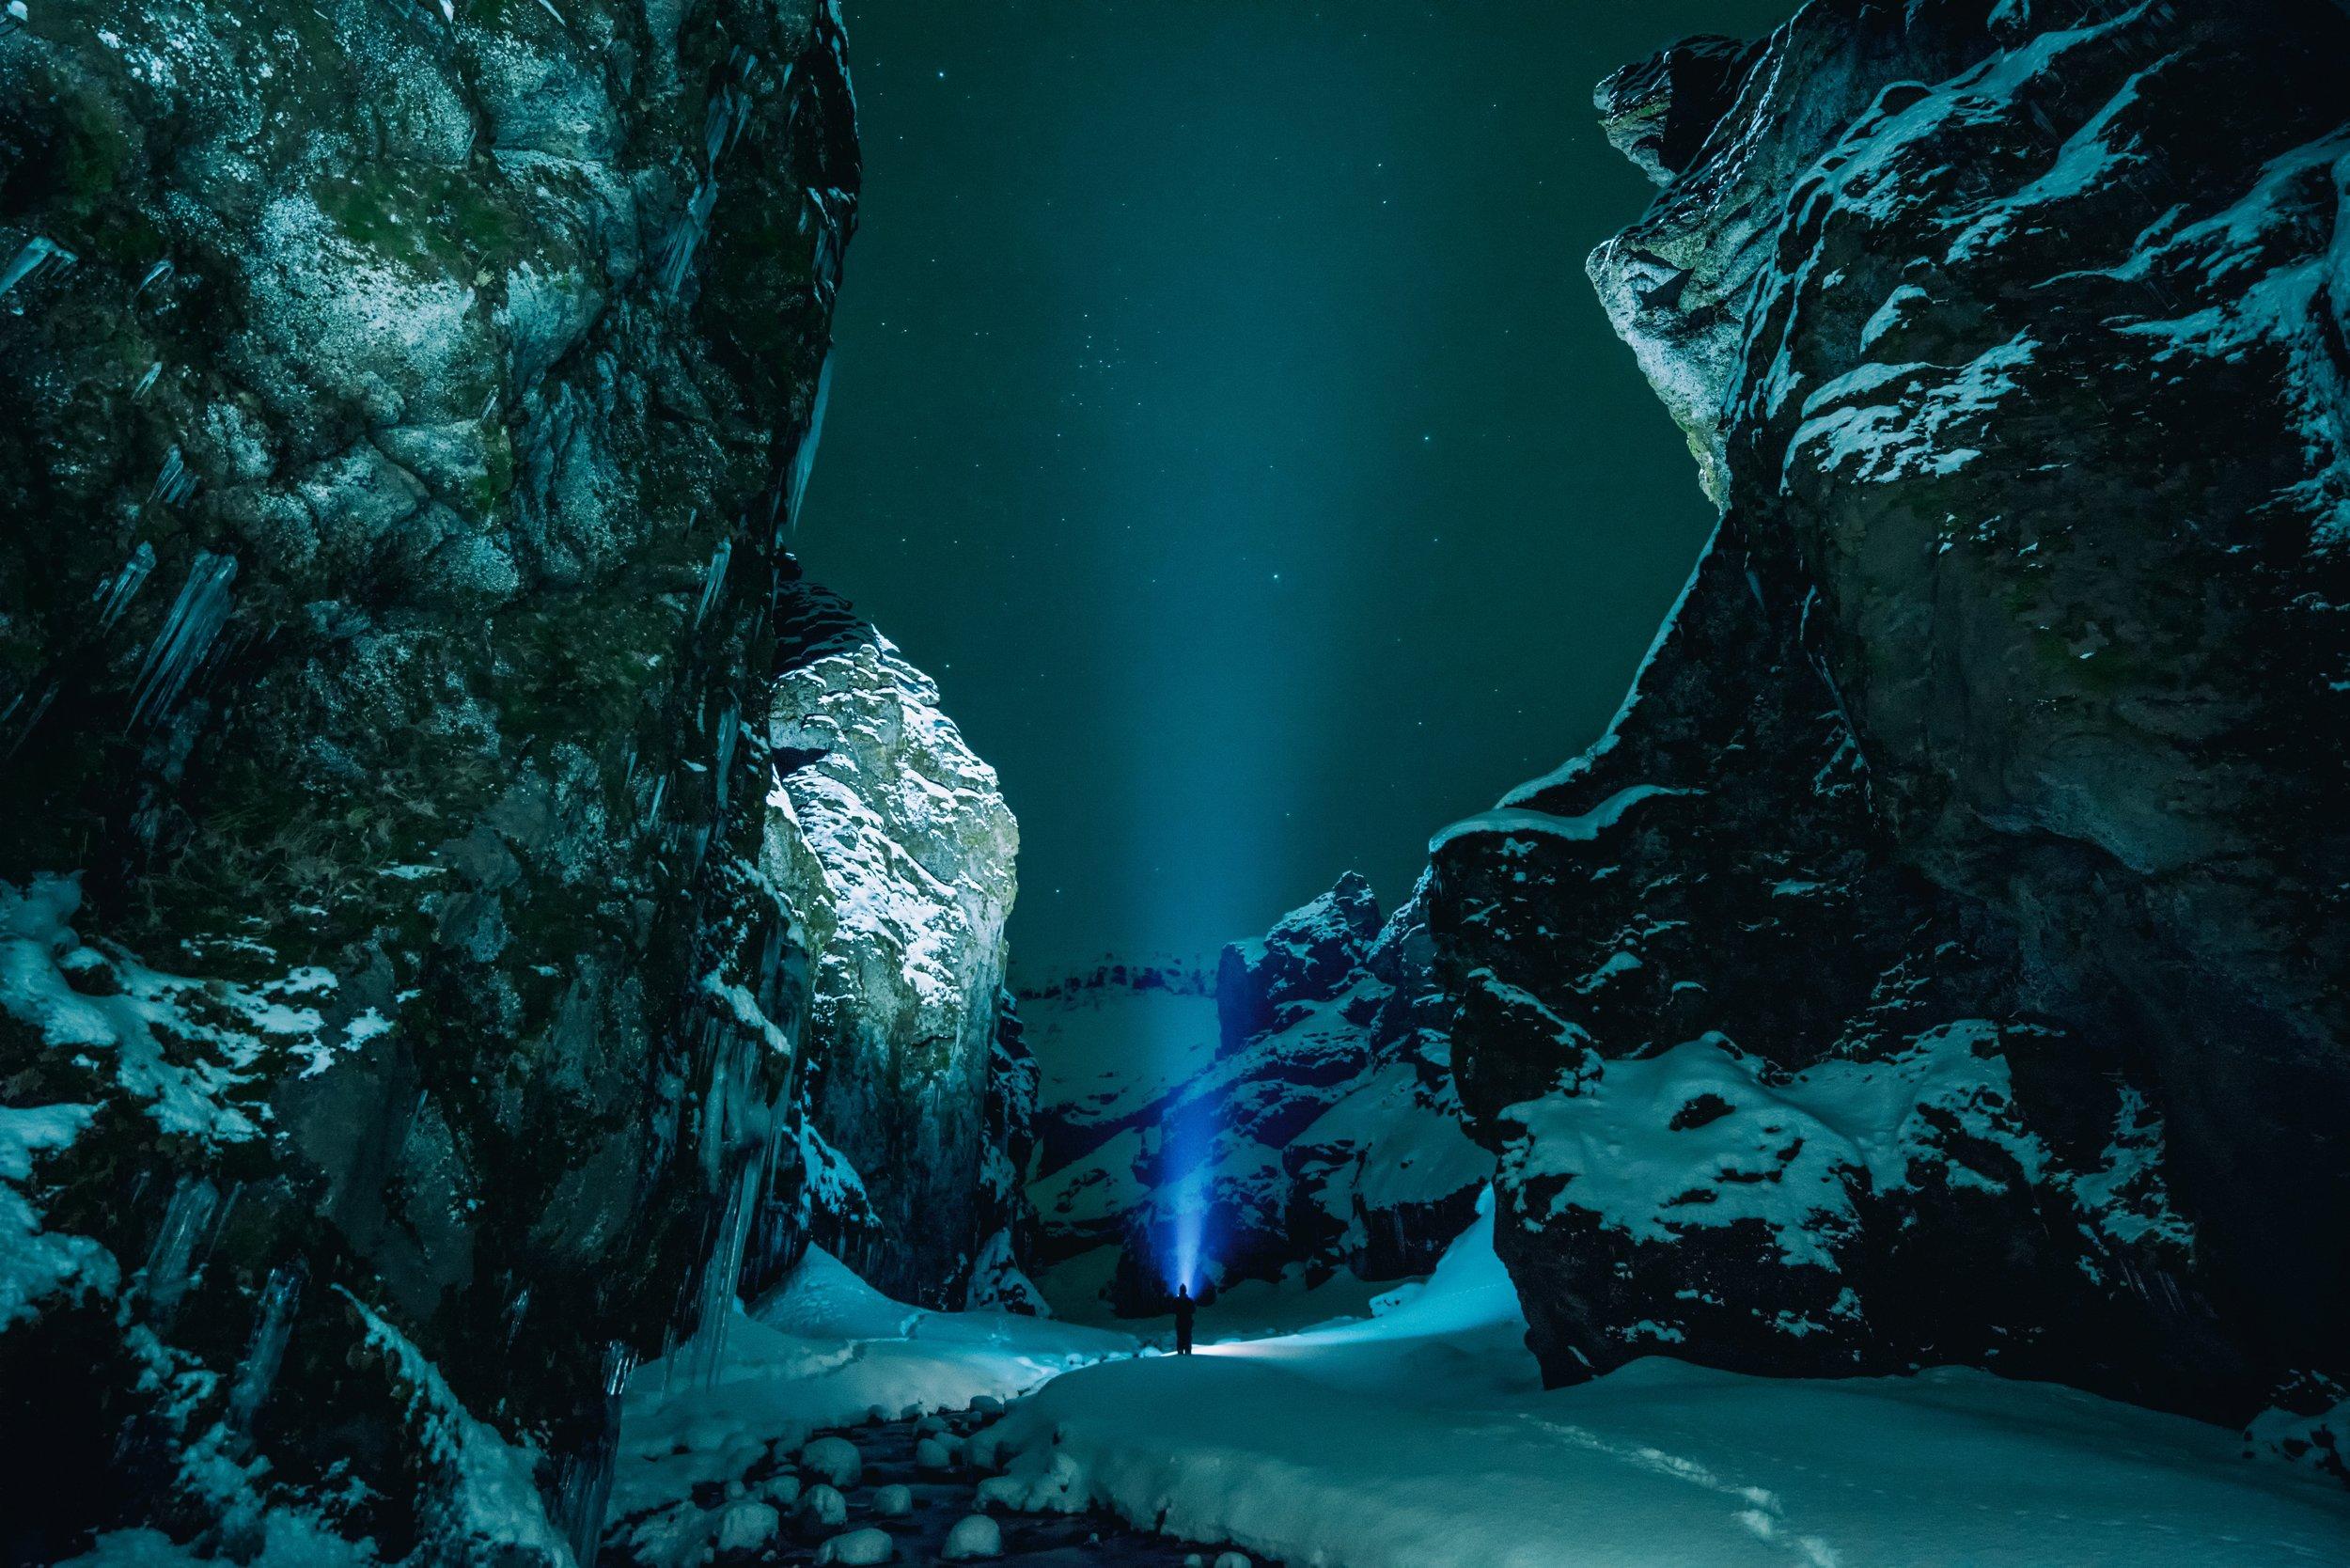 Iceland photo by Jonatan Pie